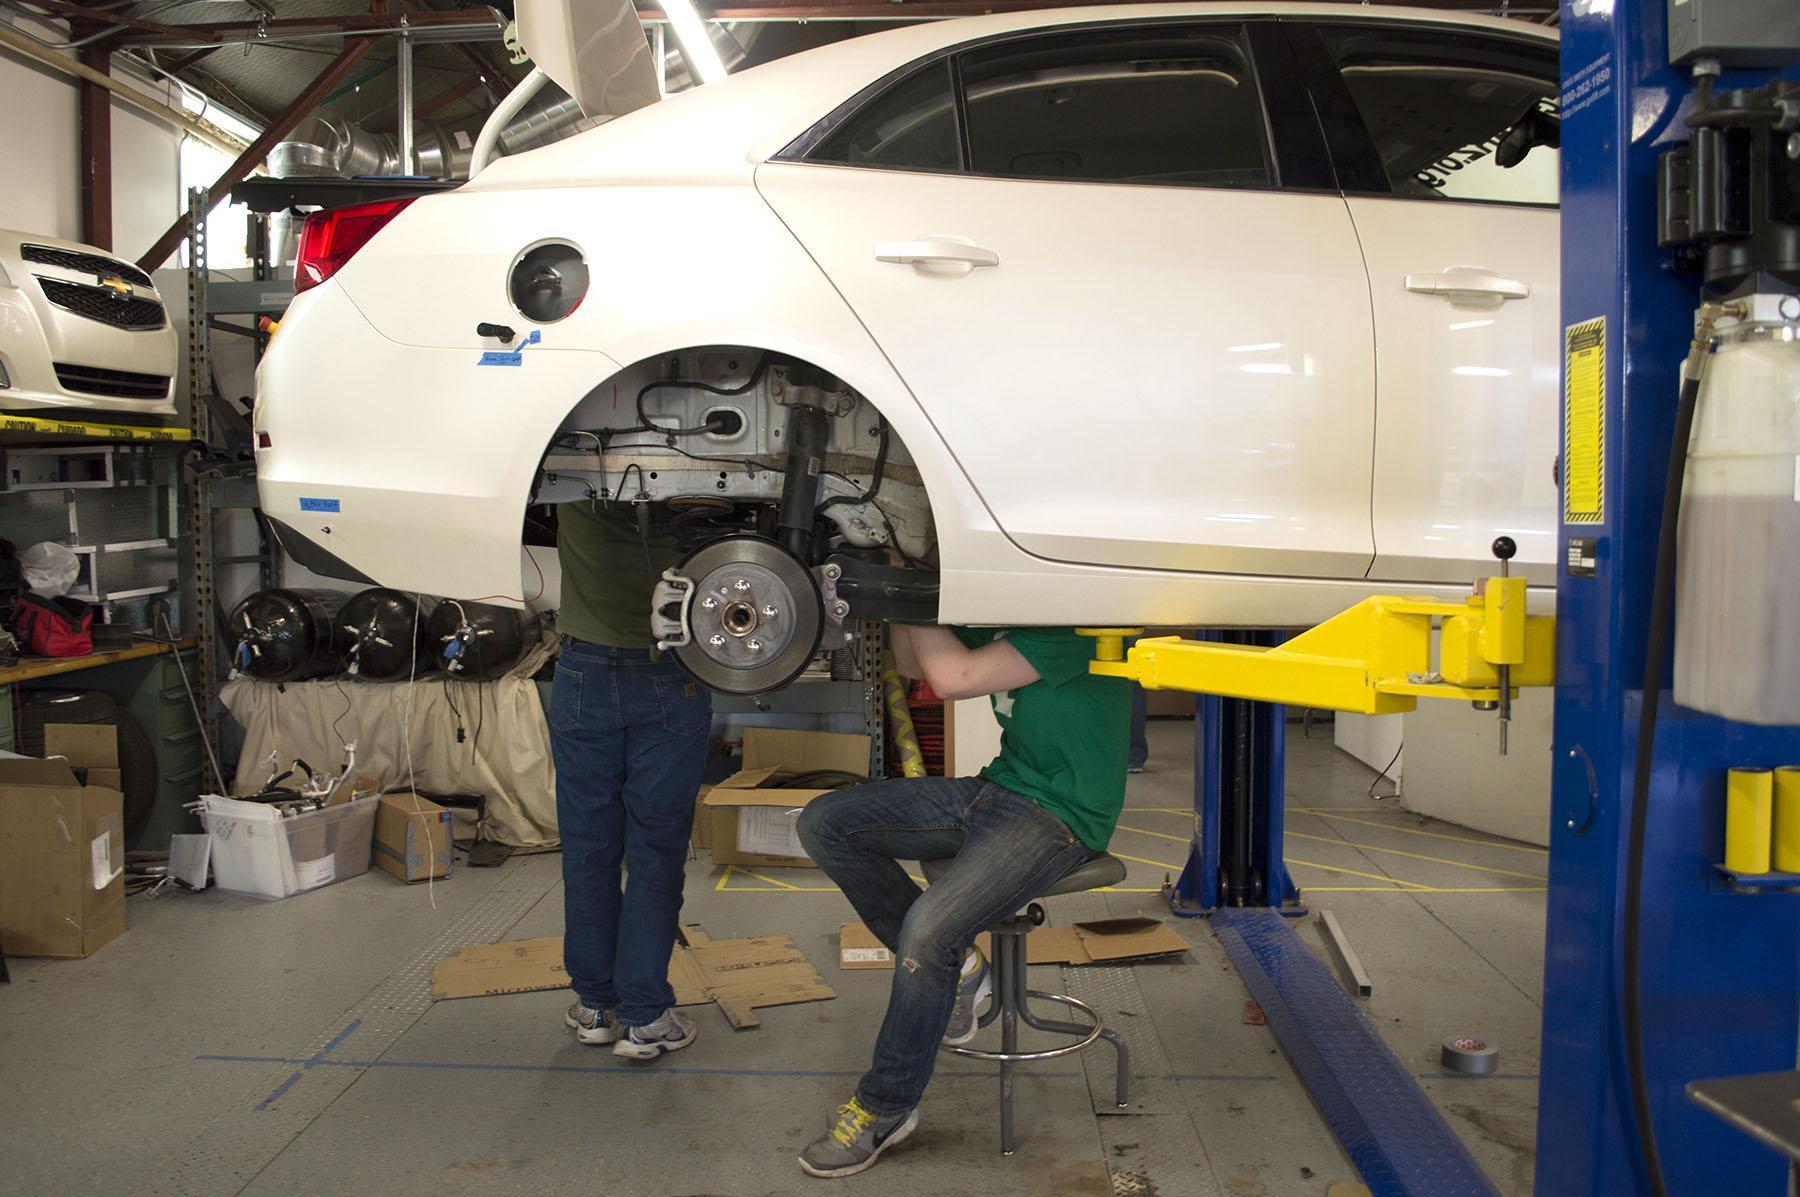 Ecocar2 Ram Racing Help Launch Electric Vehicle Community